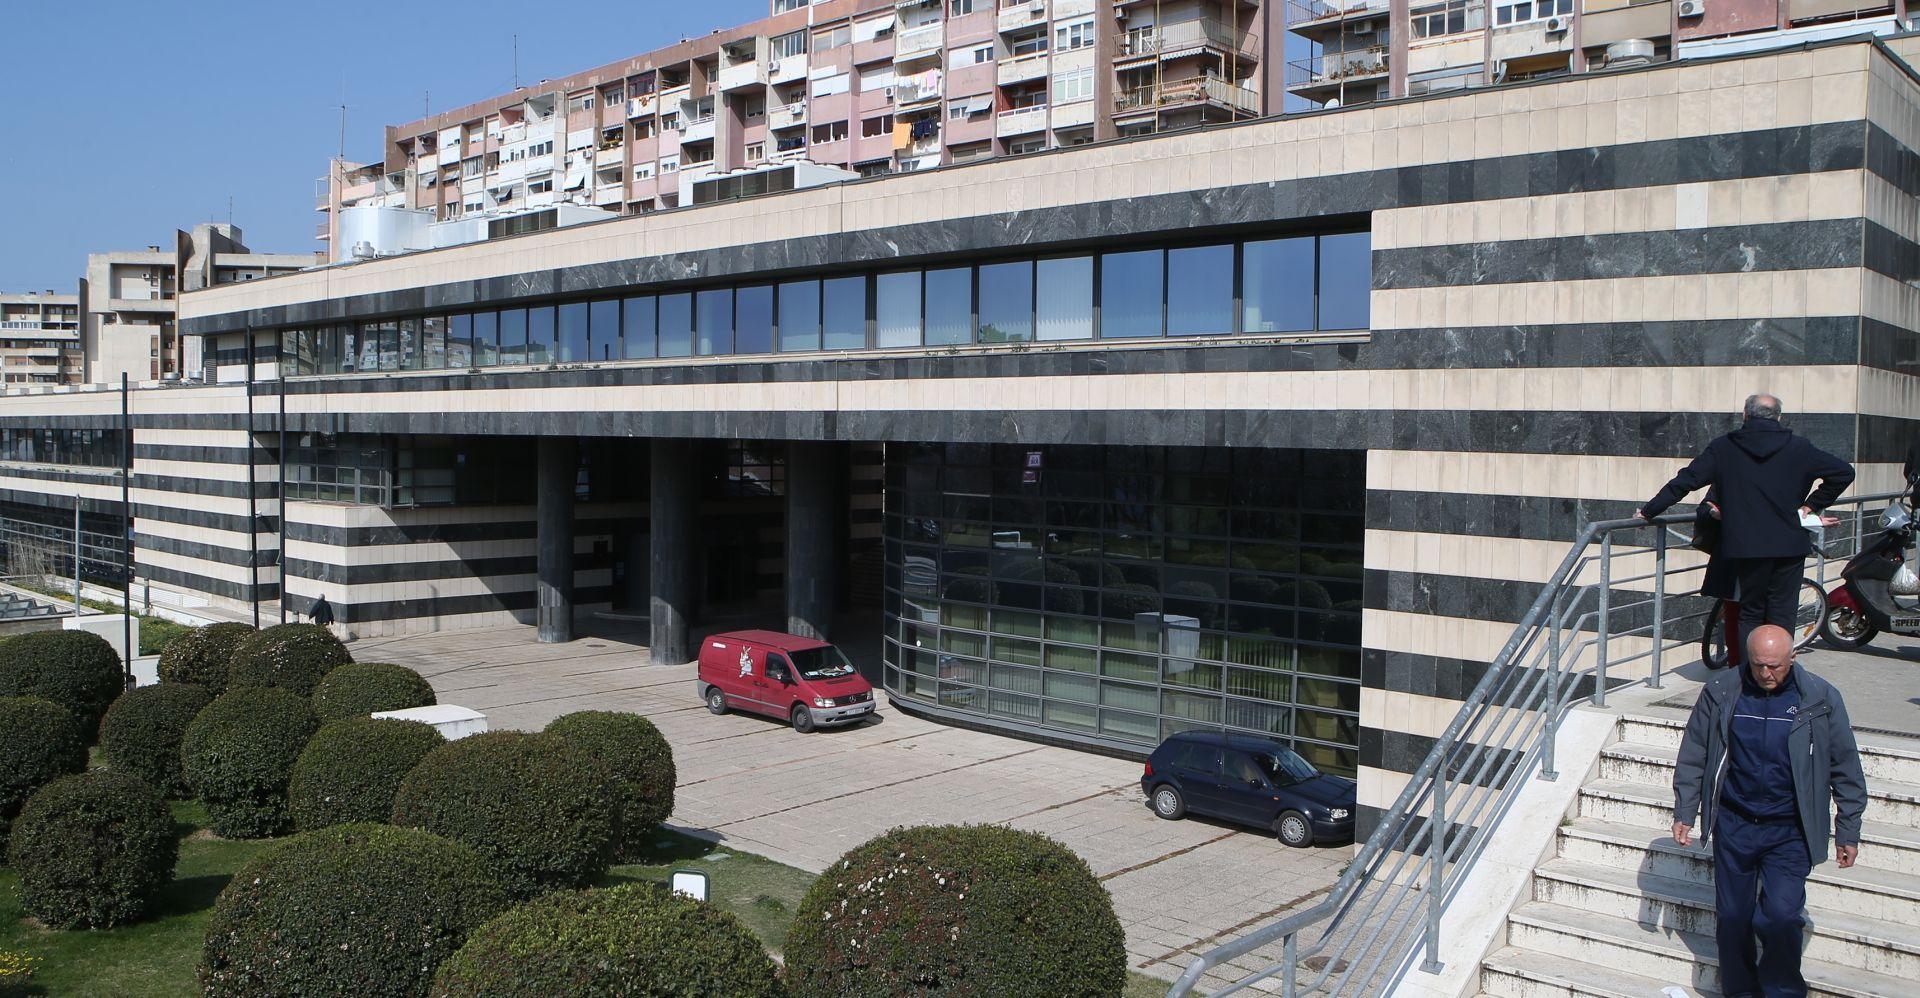 Splitsko sveučilište bolje od zagrebačkog